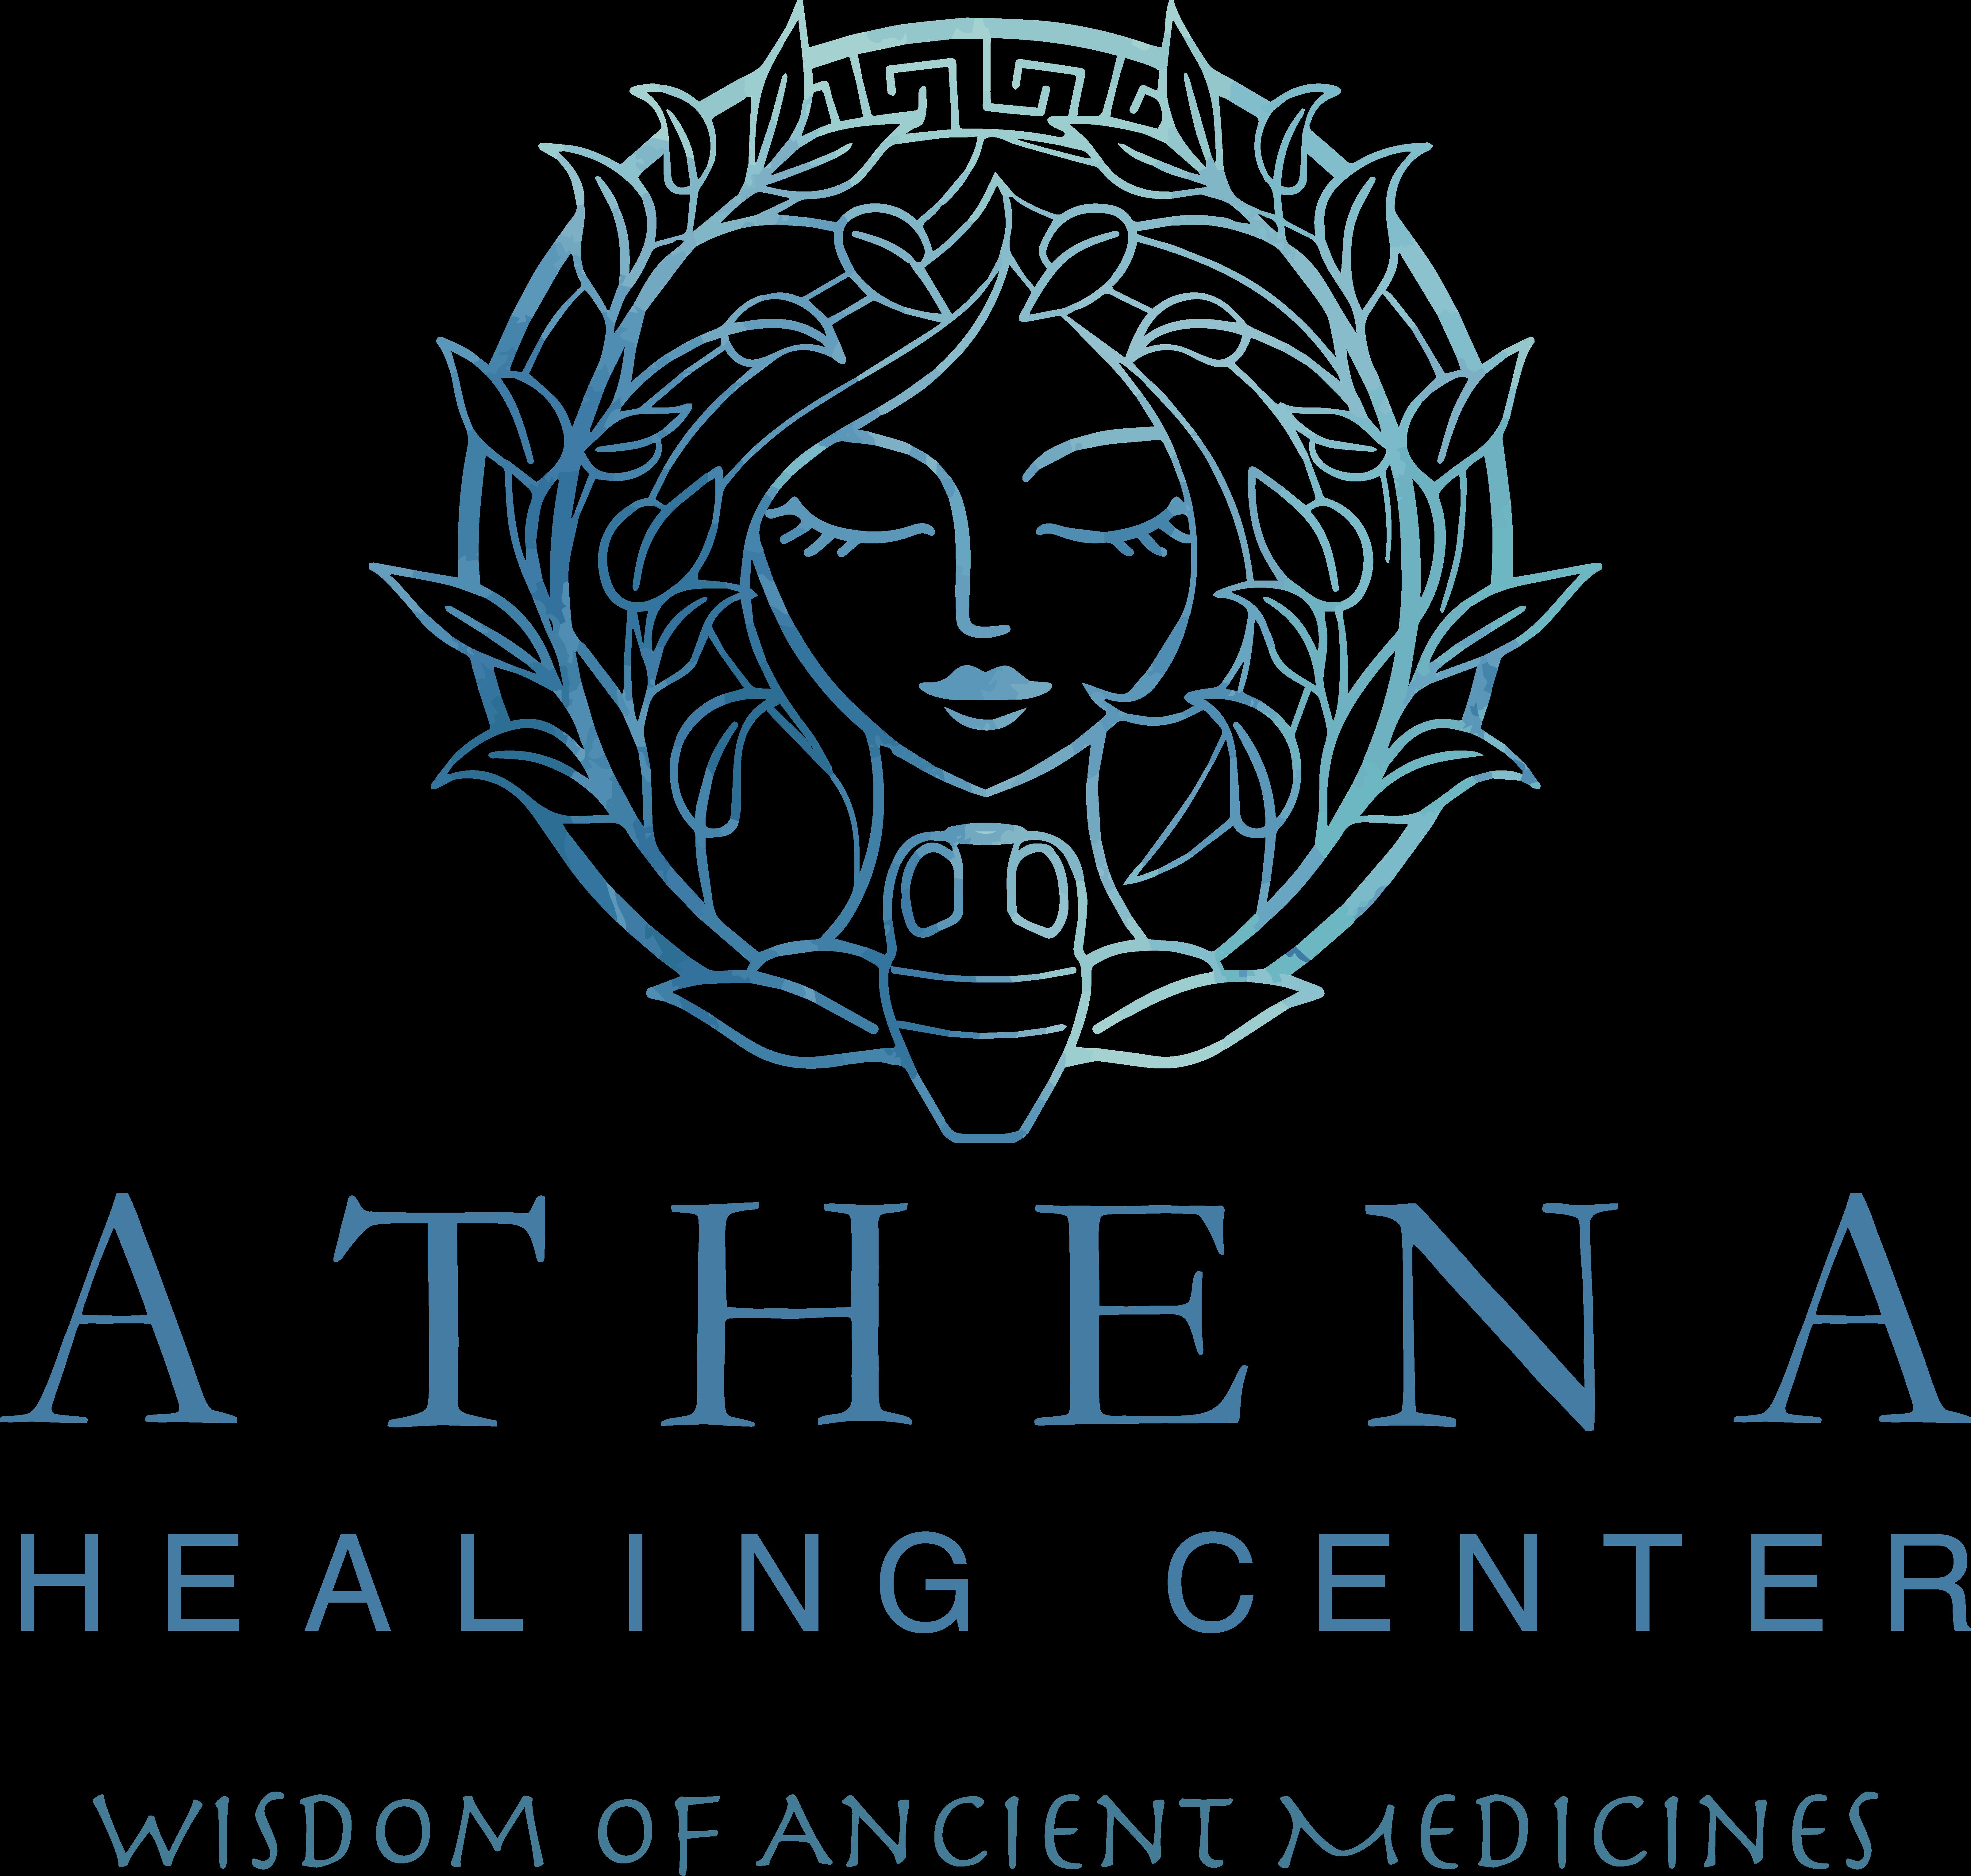 Athena Healing Center radiance to create